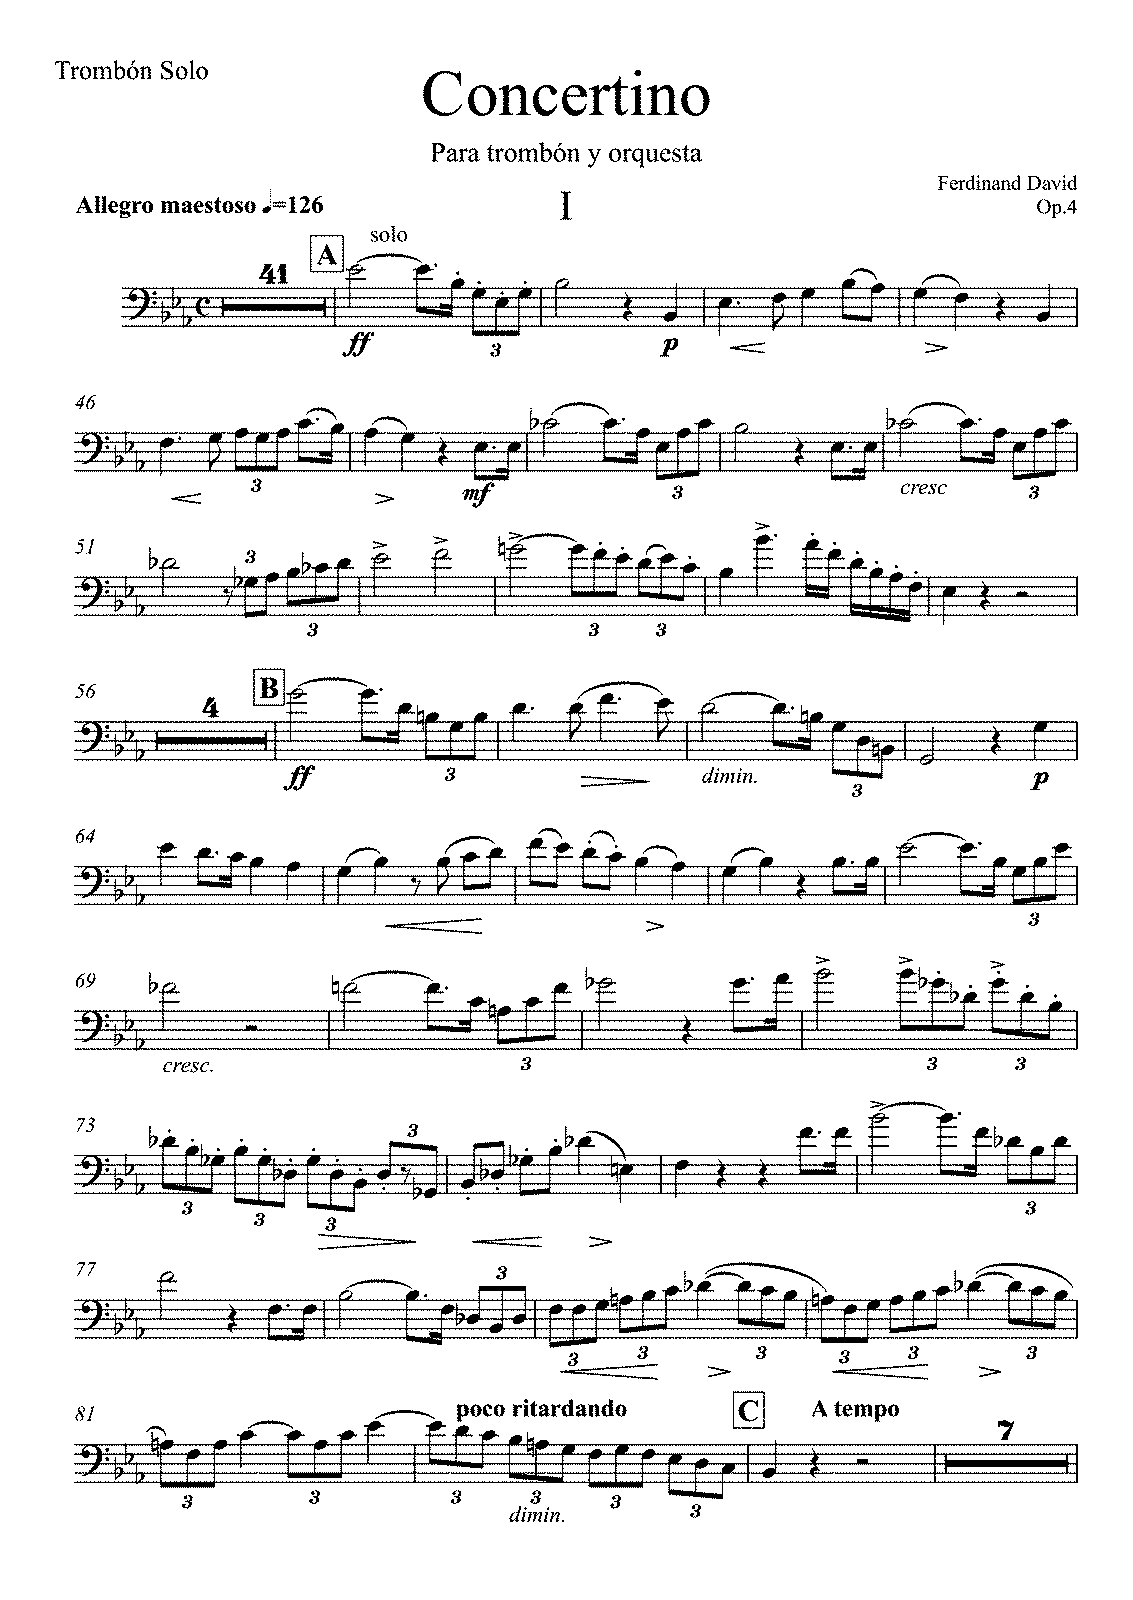 david ferdinand trombone concertino pdf